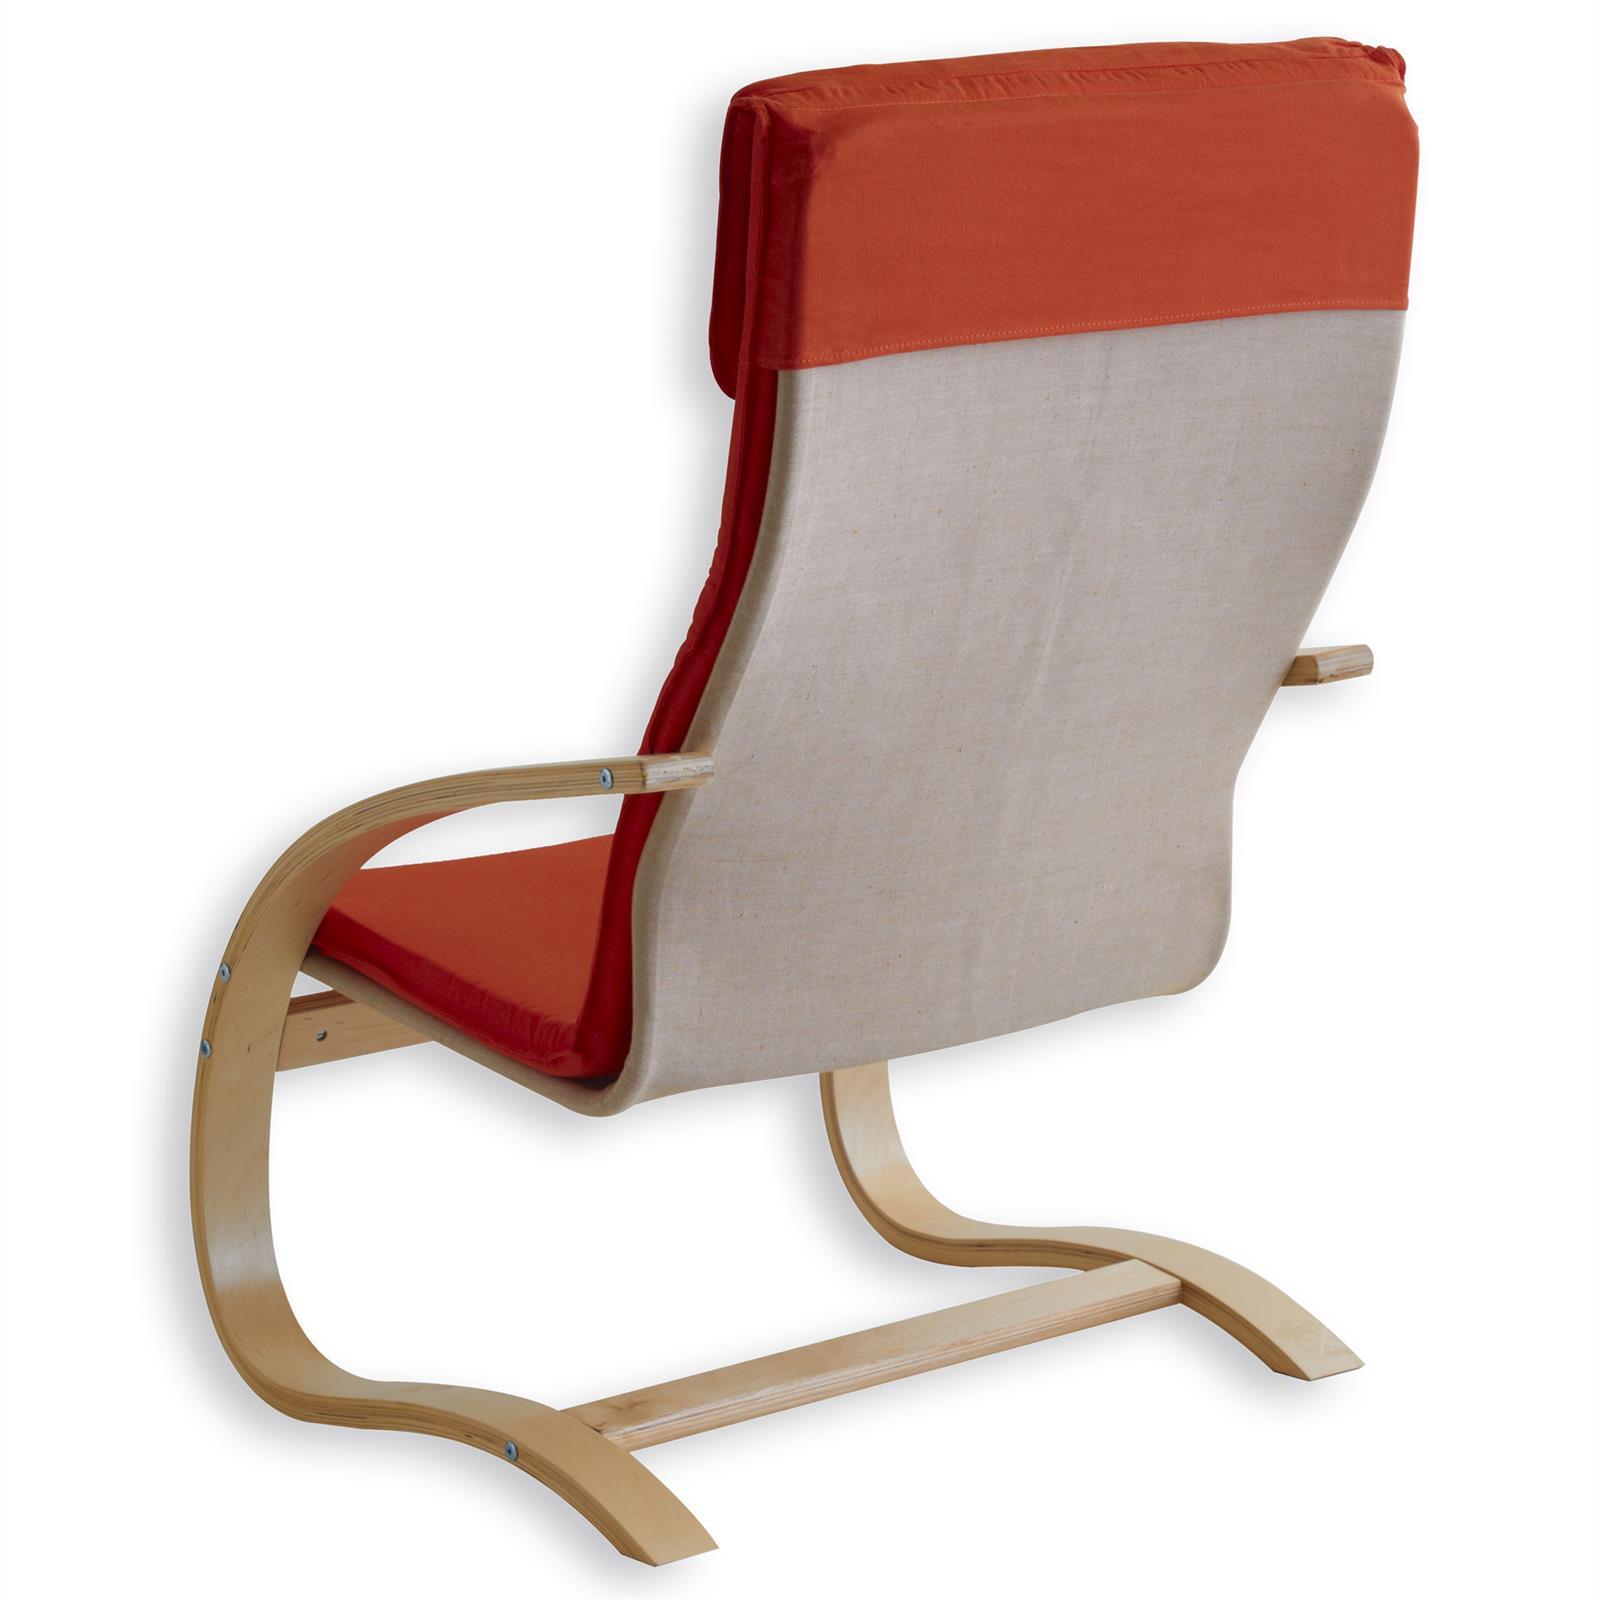 Freischwinger Sessel Pello Schwingsessel Stuhl Ikea Ruhesessel Neu hQrtCsd